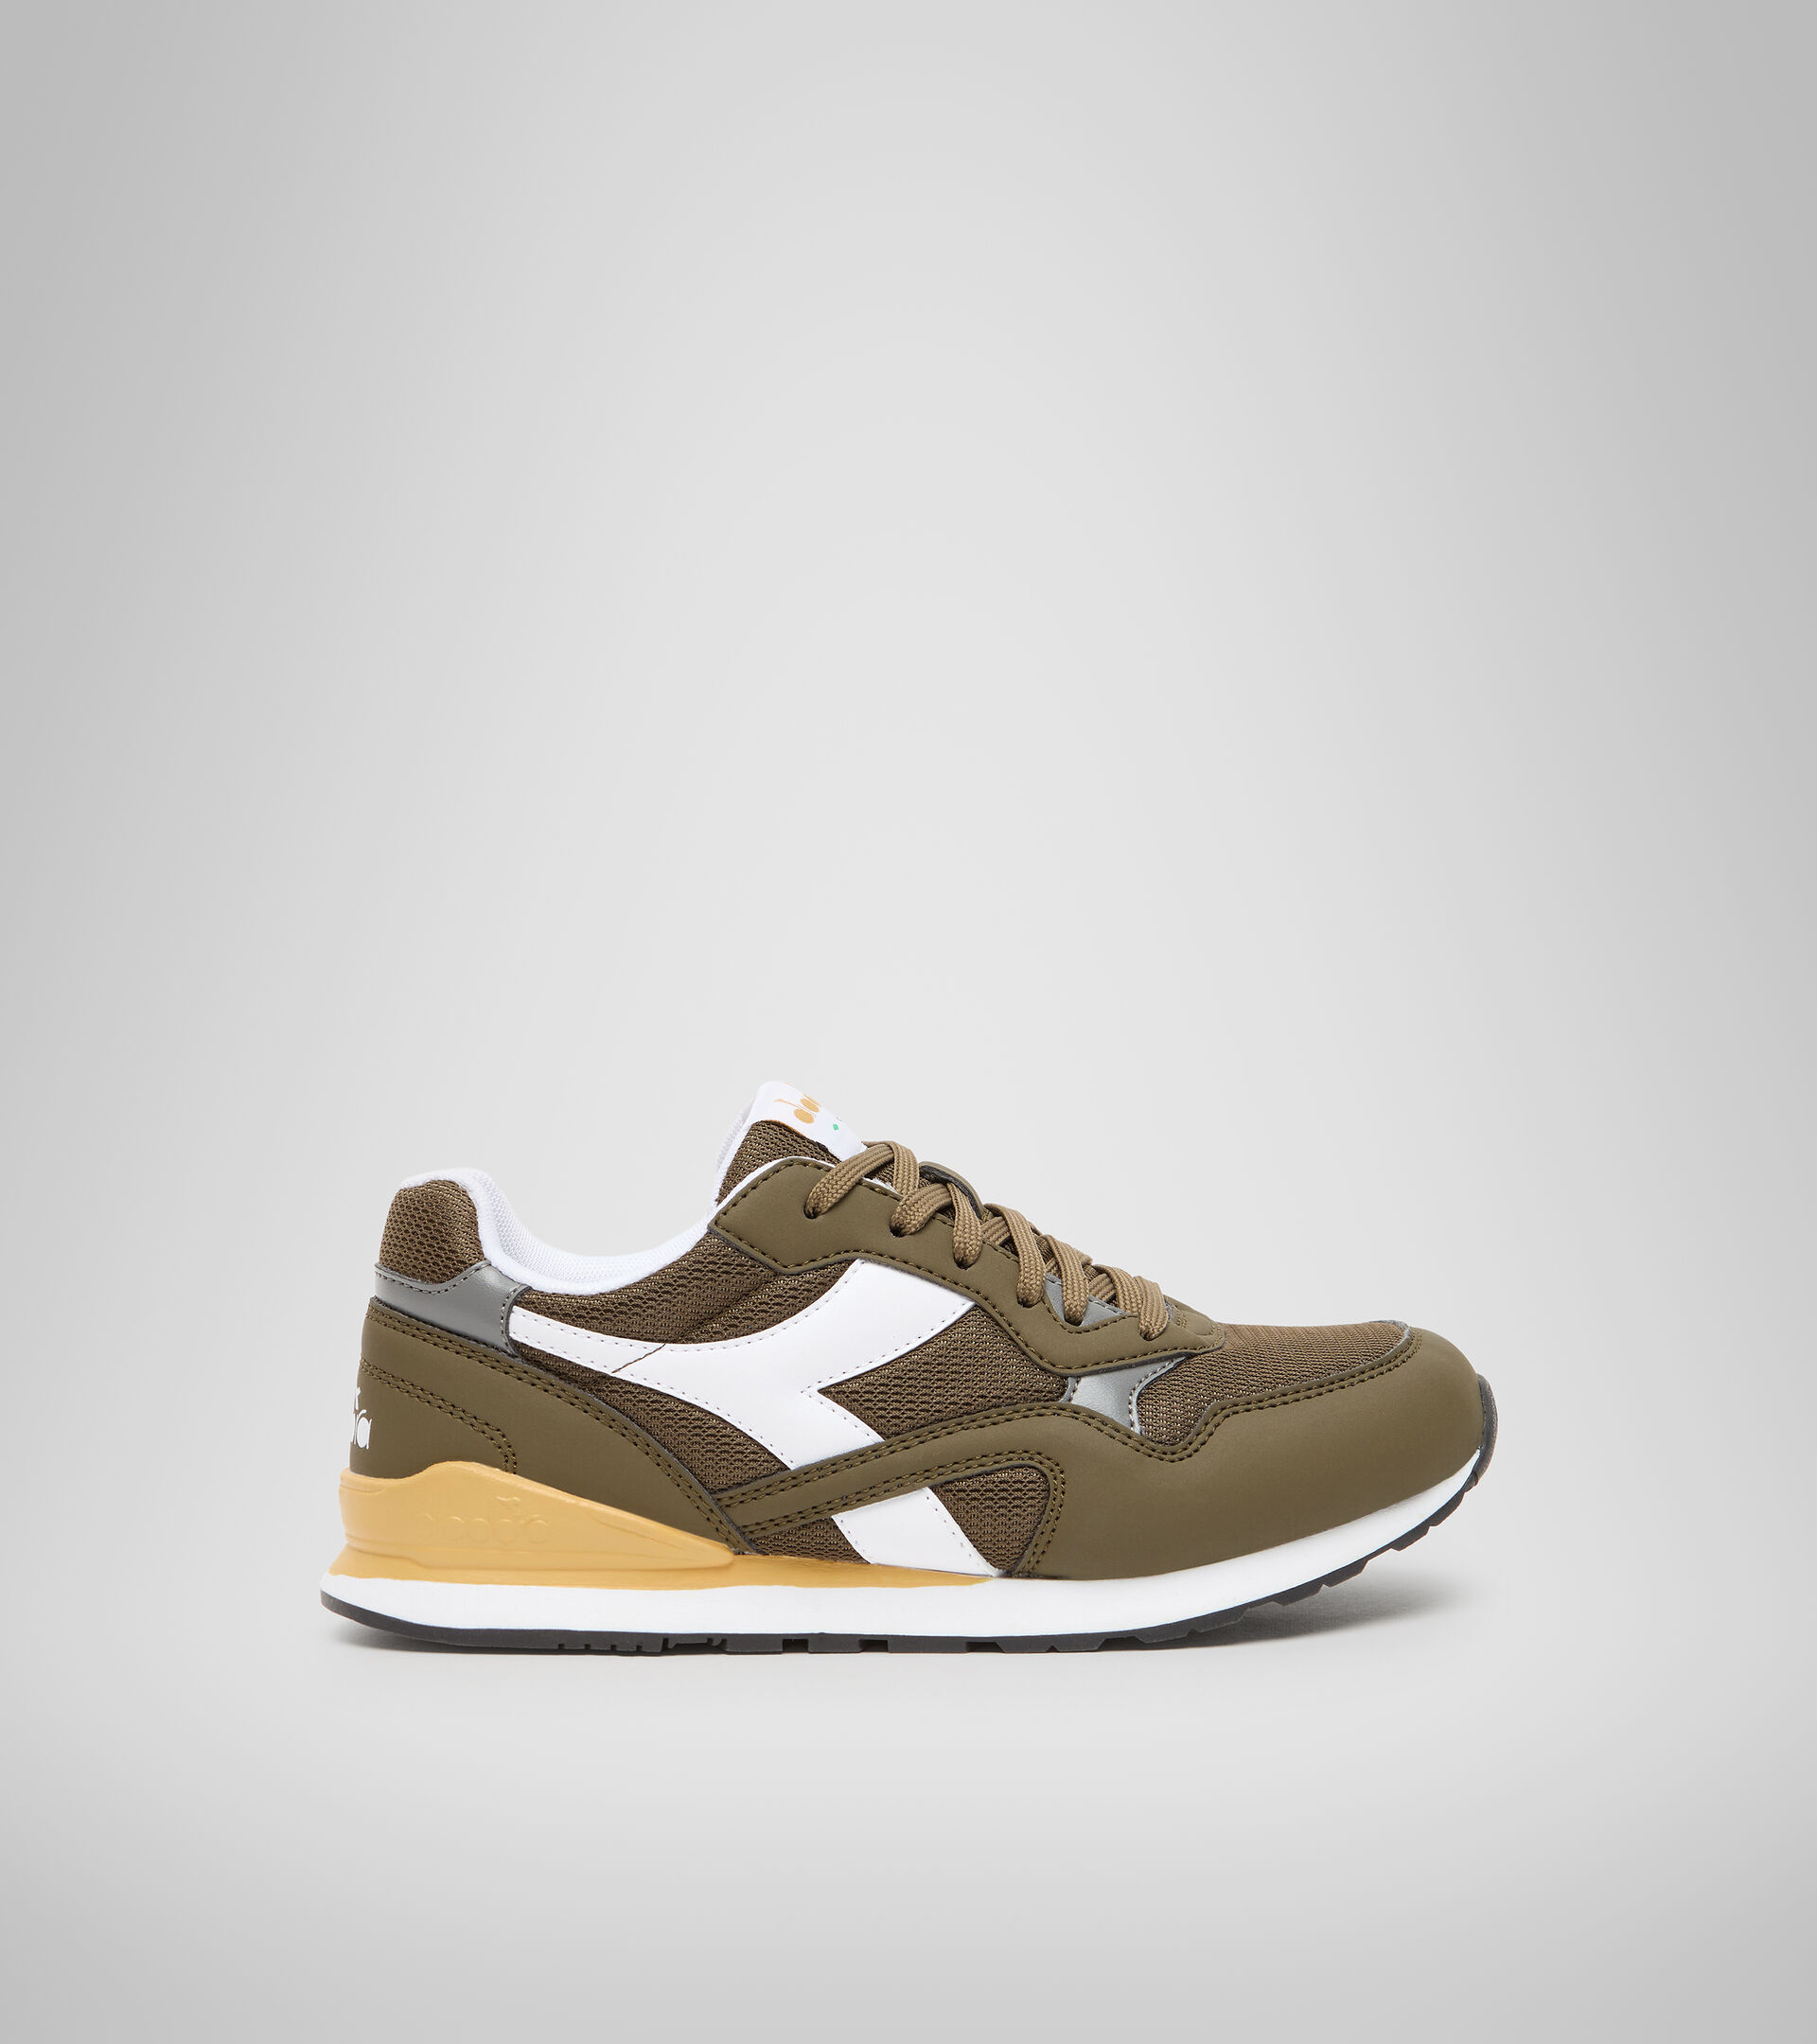 Footwear Sport BAMBINO N.92 GS VERDE OLIVA. Diadora